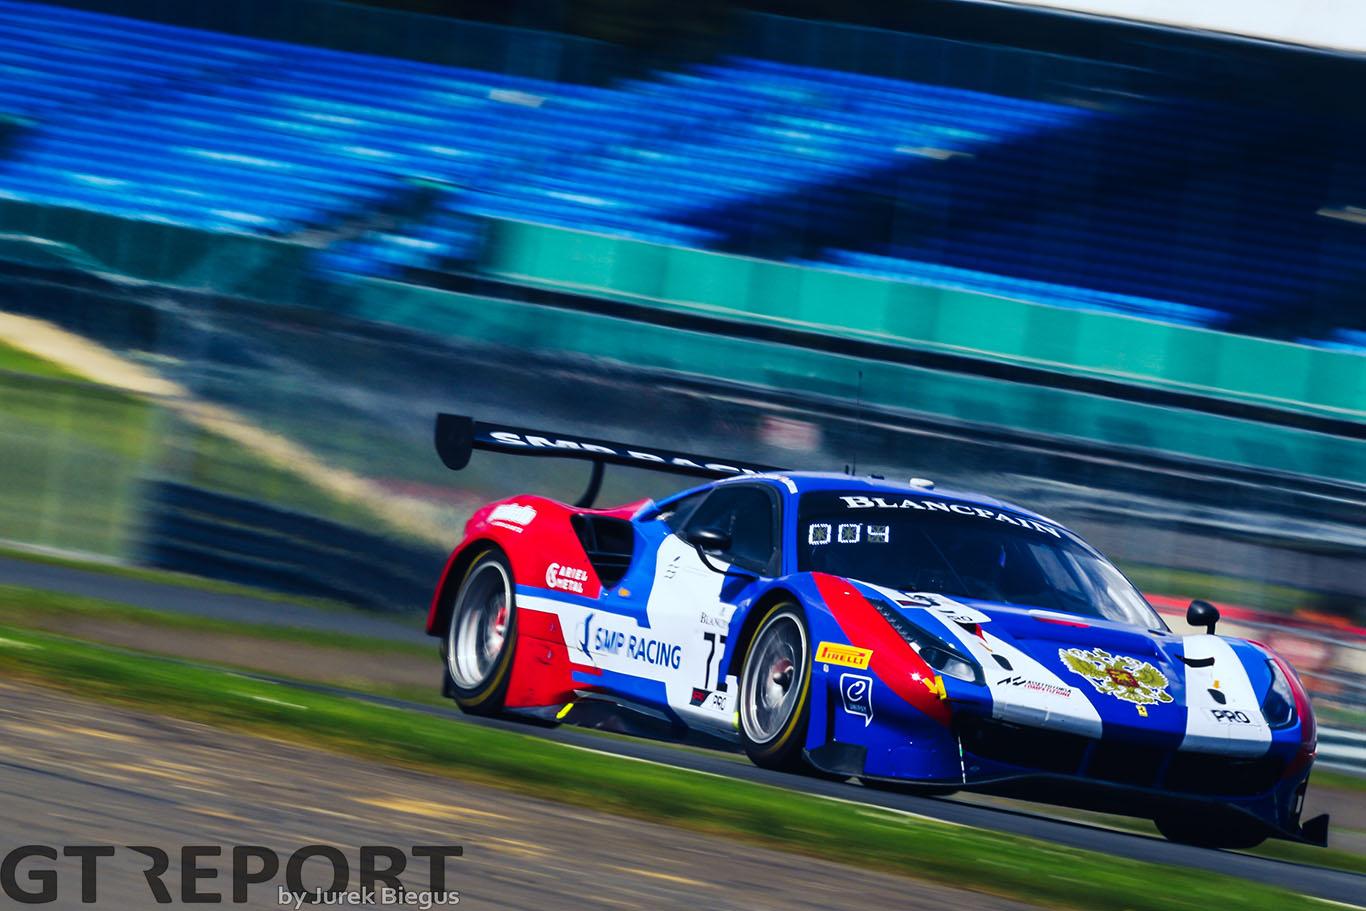 Spa 24 Hours preview: Ferrari